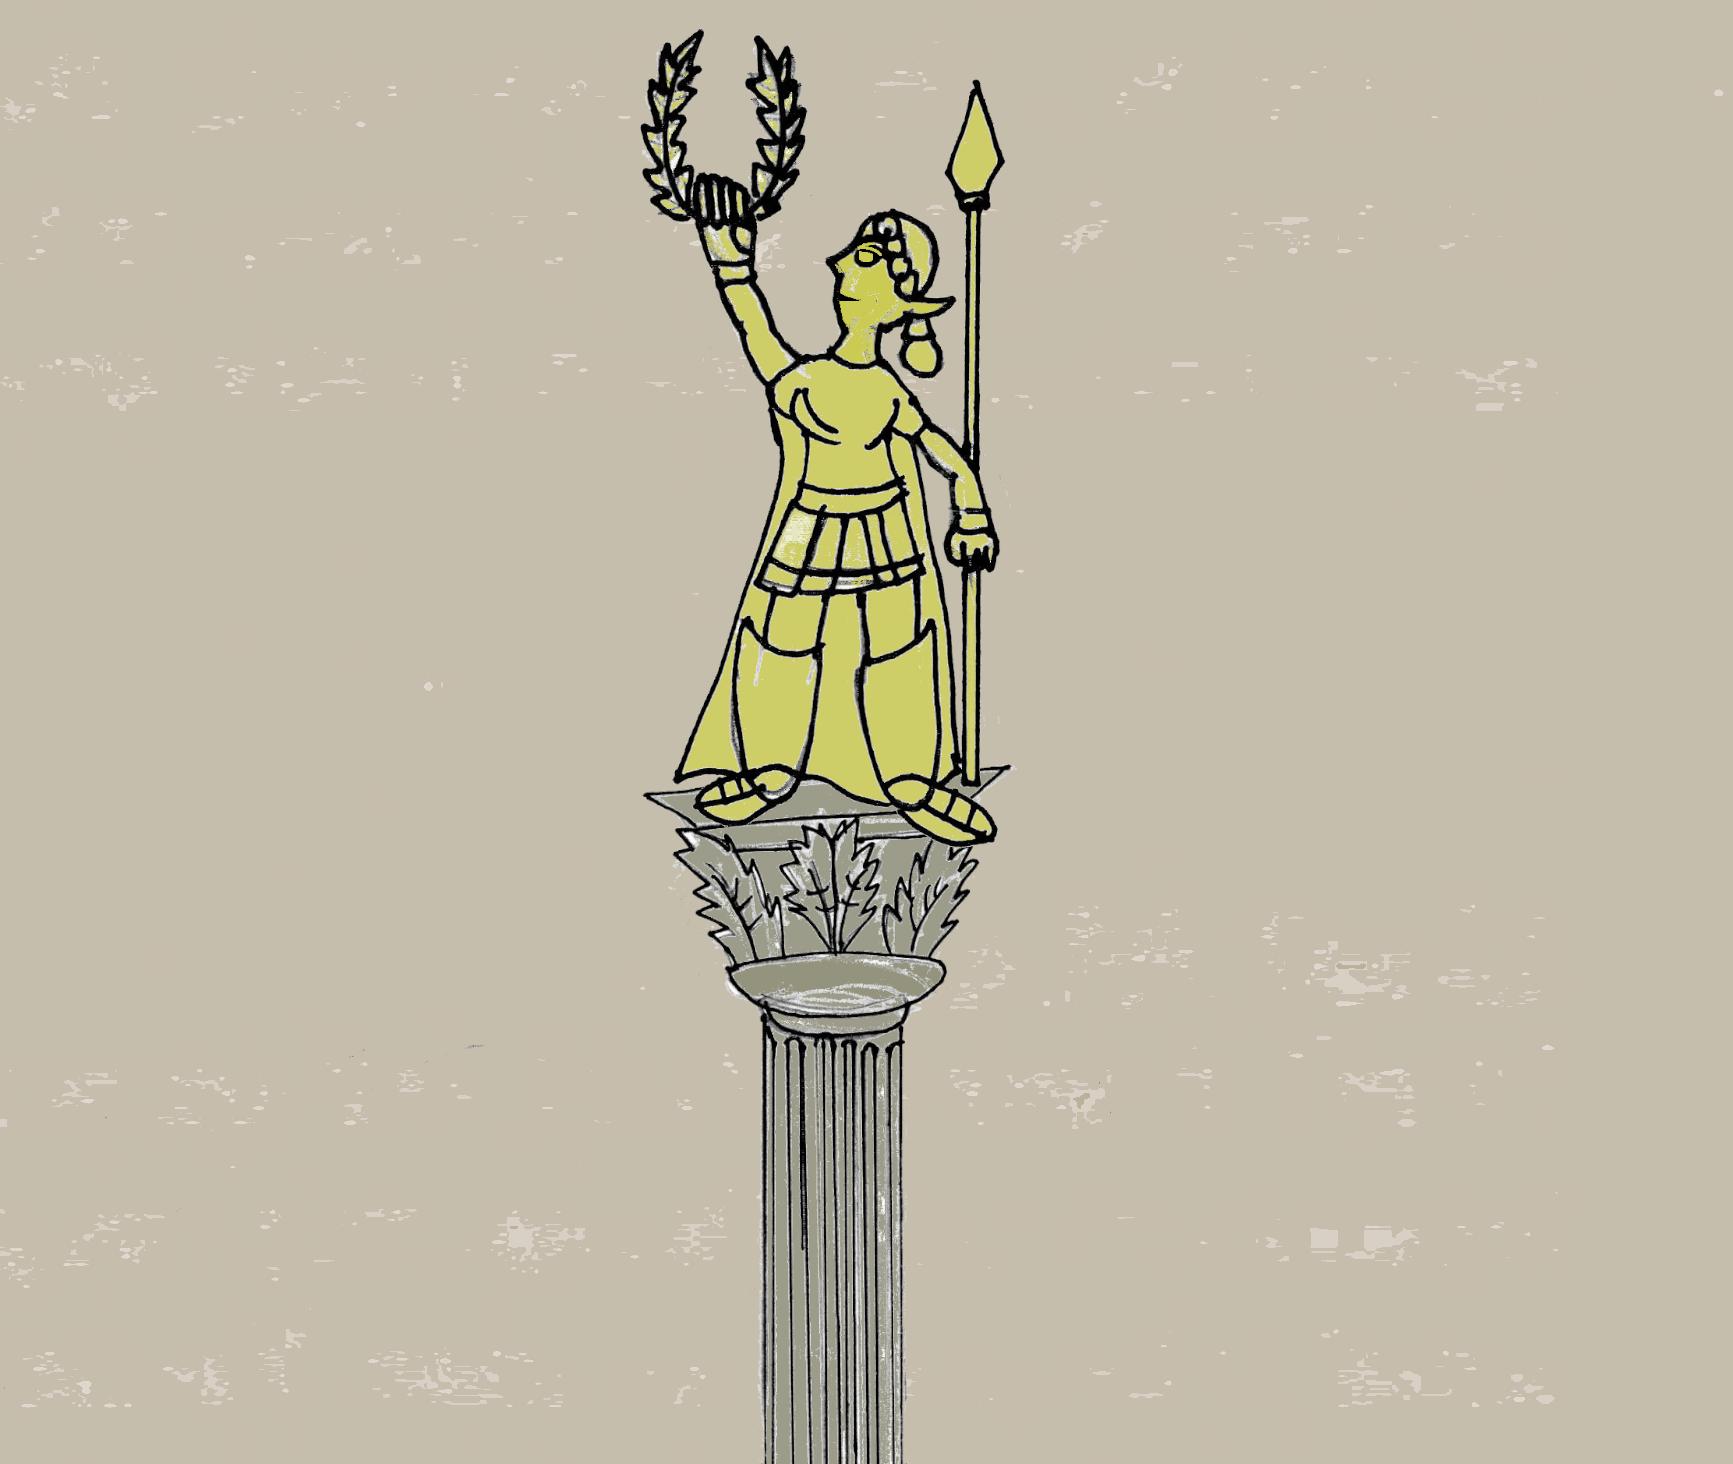 A statue of the Amazon goddess Parthene.